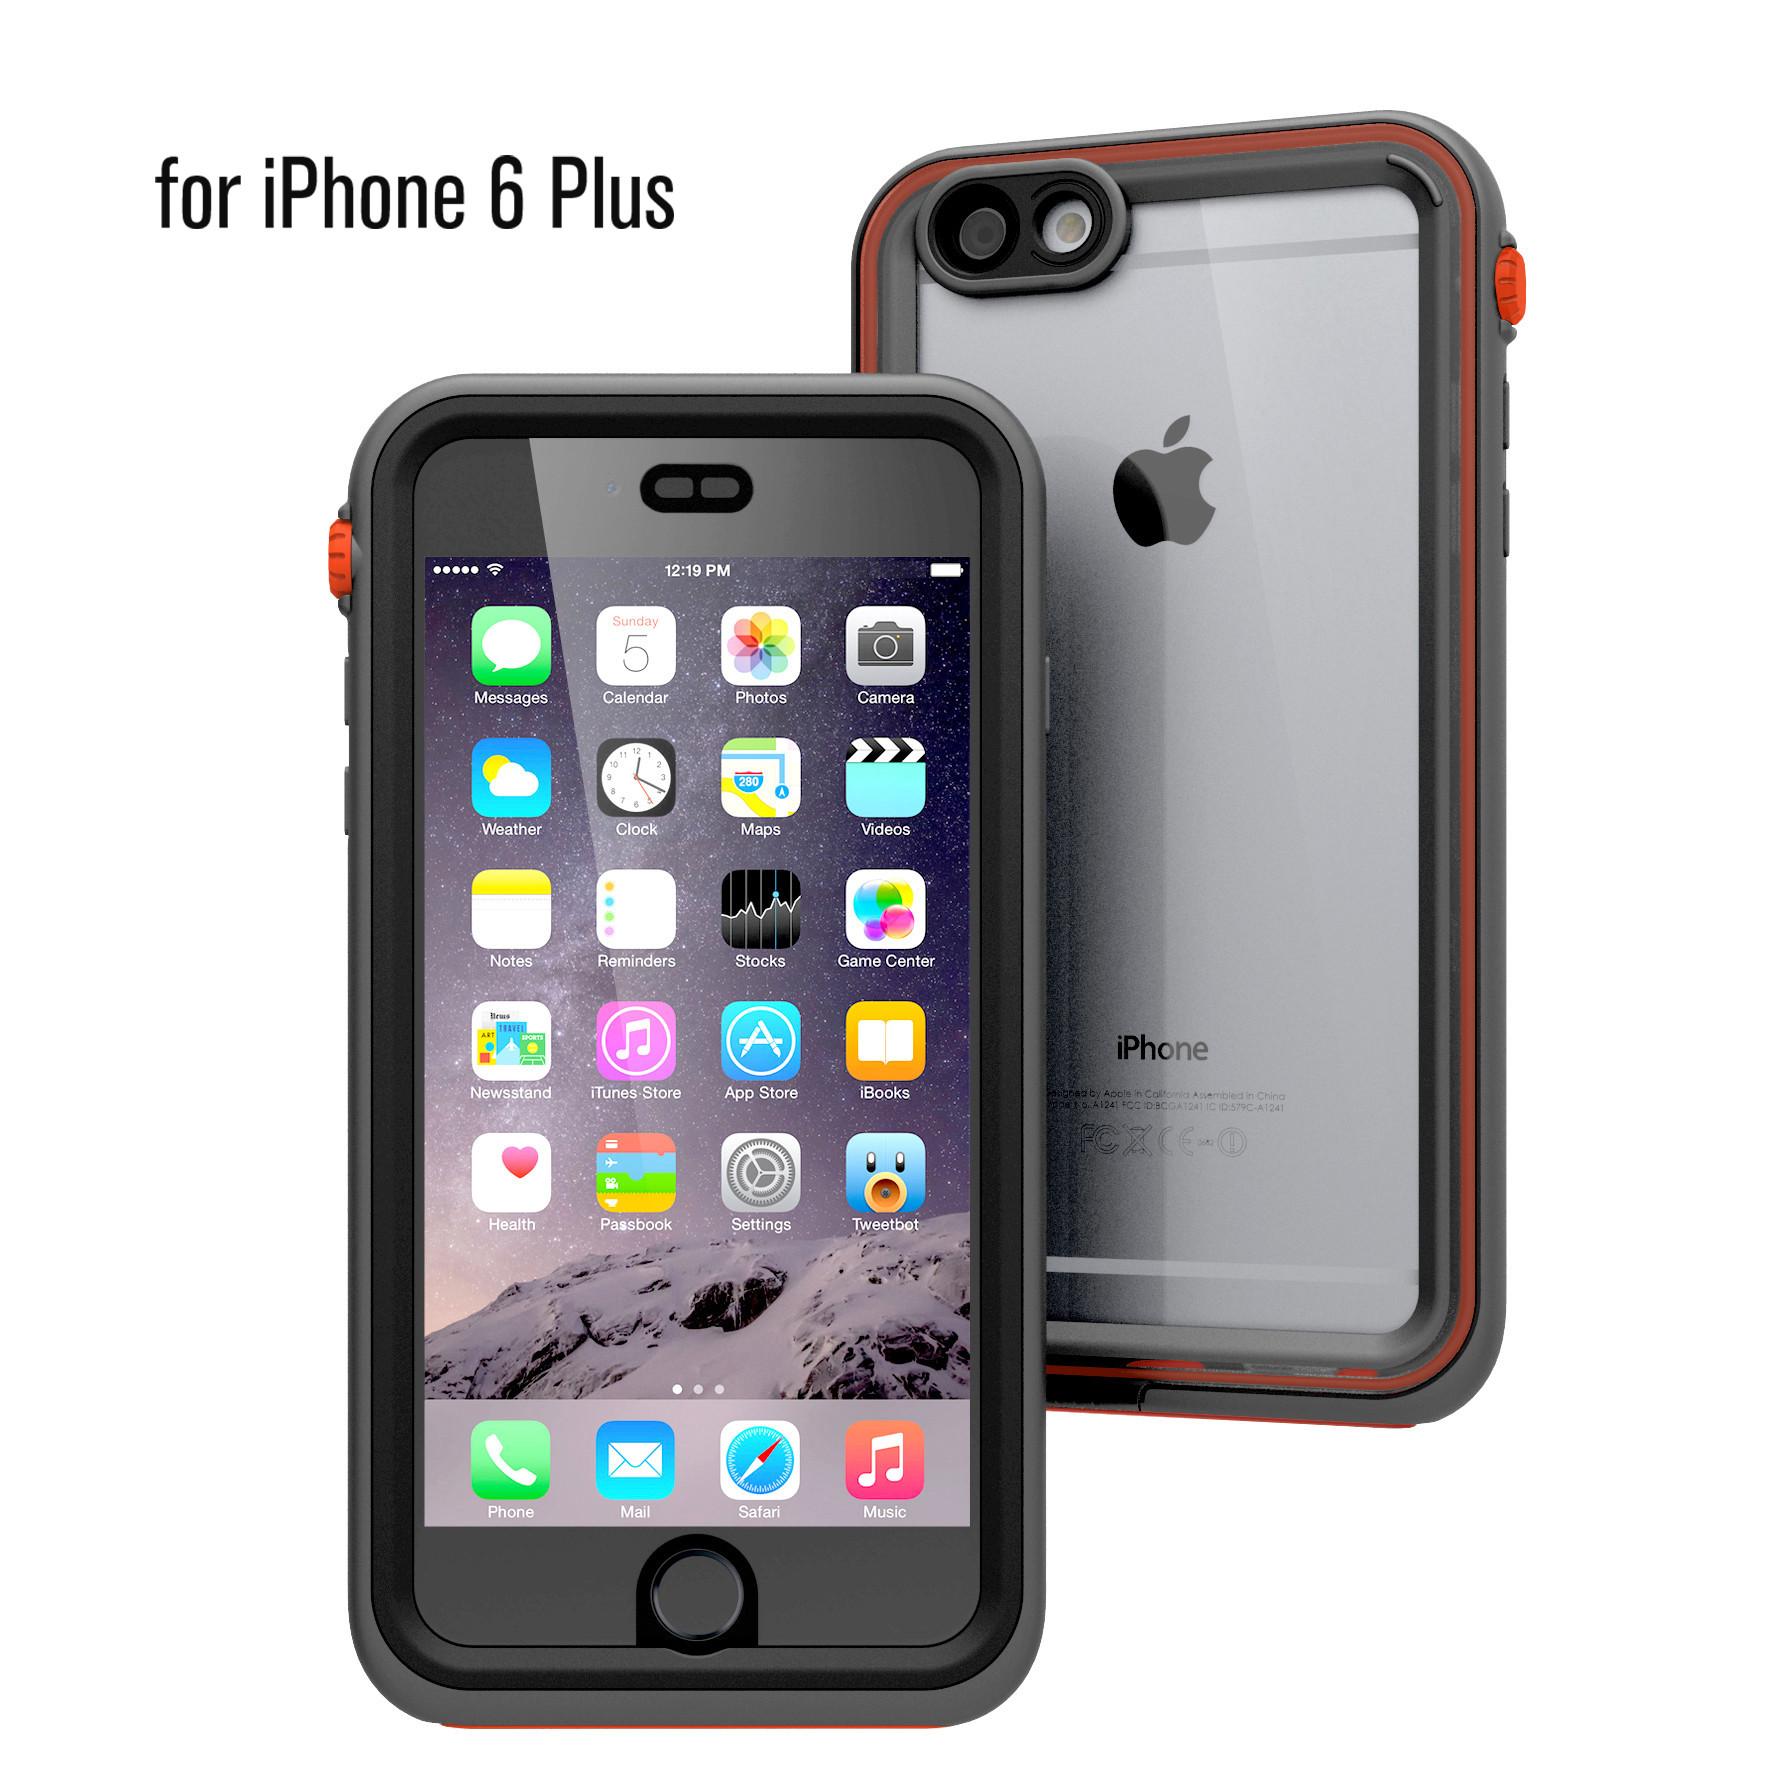 Catalyst Αδιάβροχη Θήκη iPhone 6S Plus με TouchID - Rescue Ranger